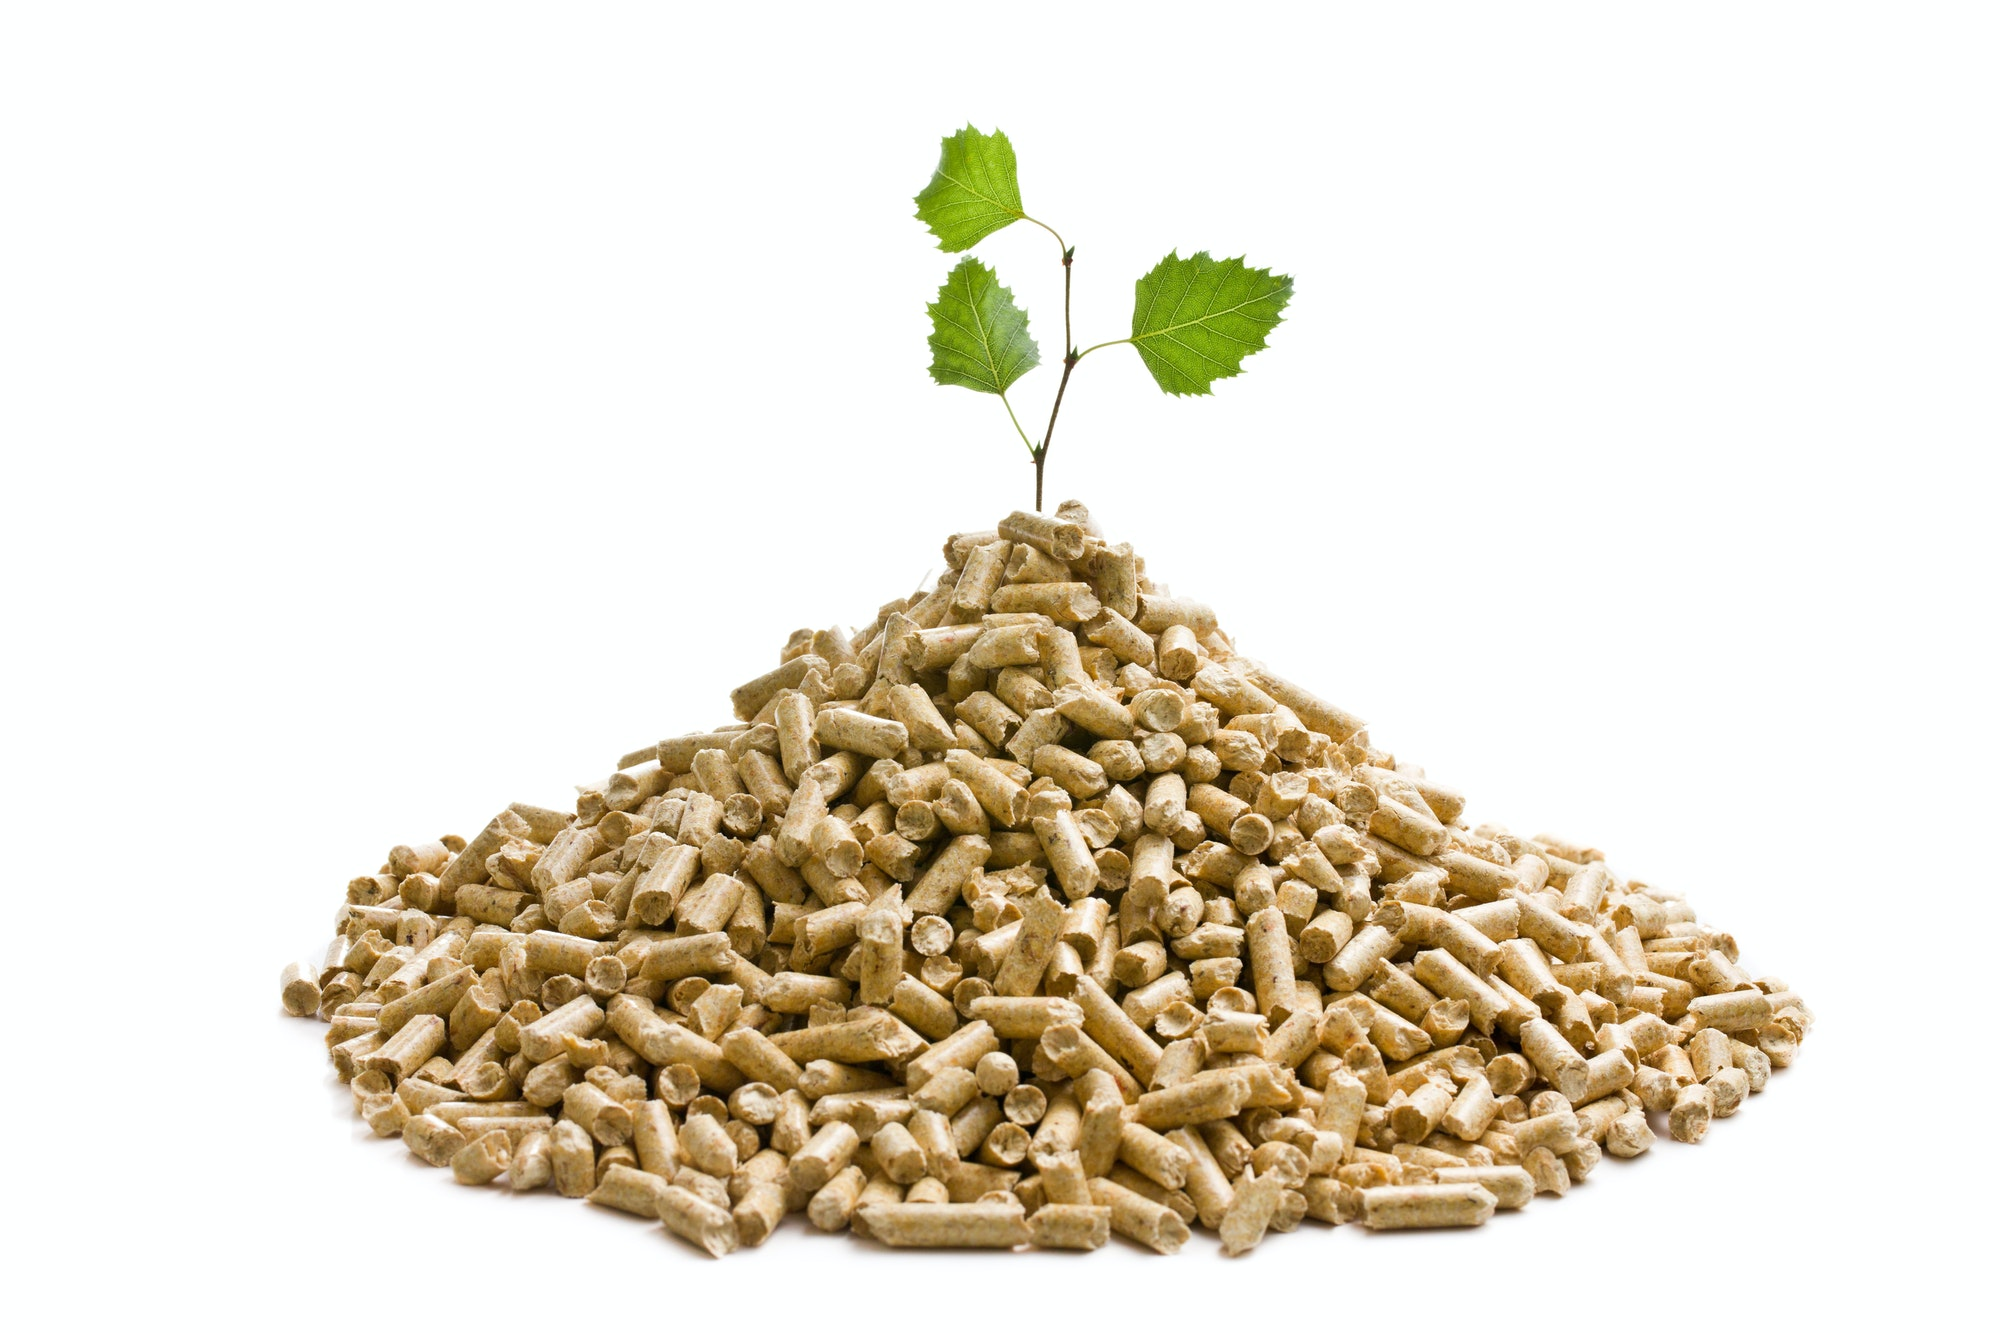 the wooden pellets